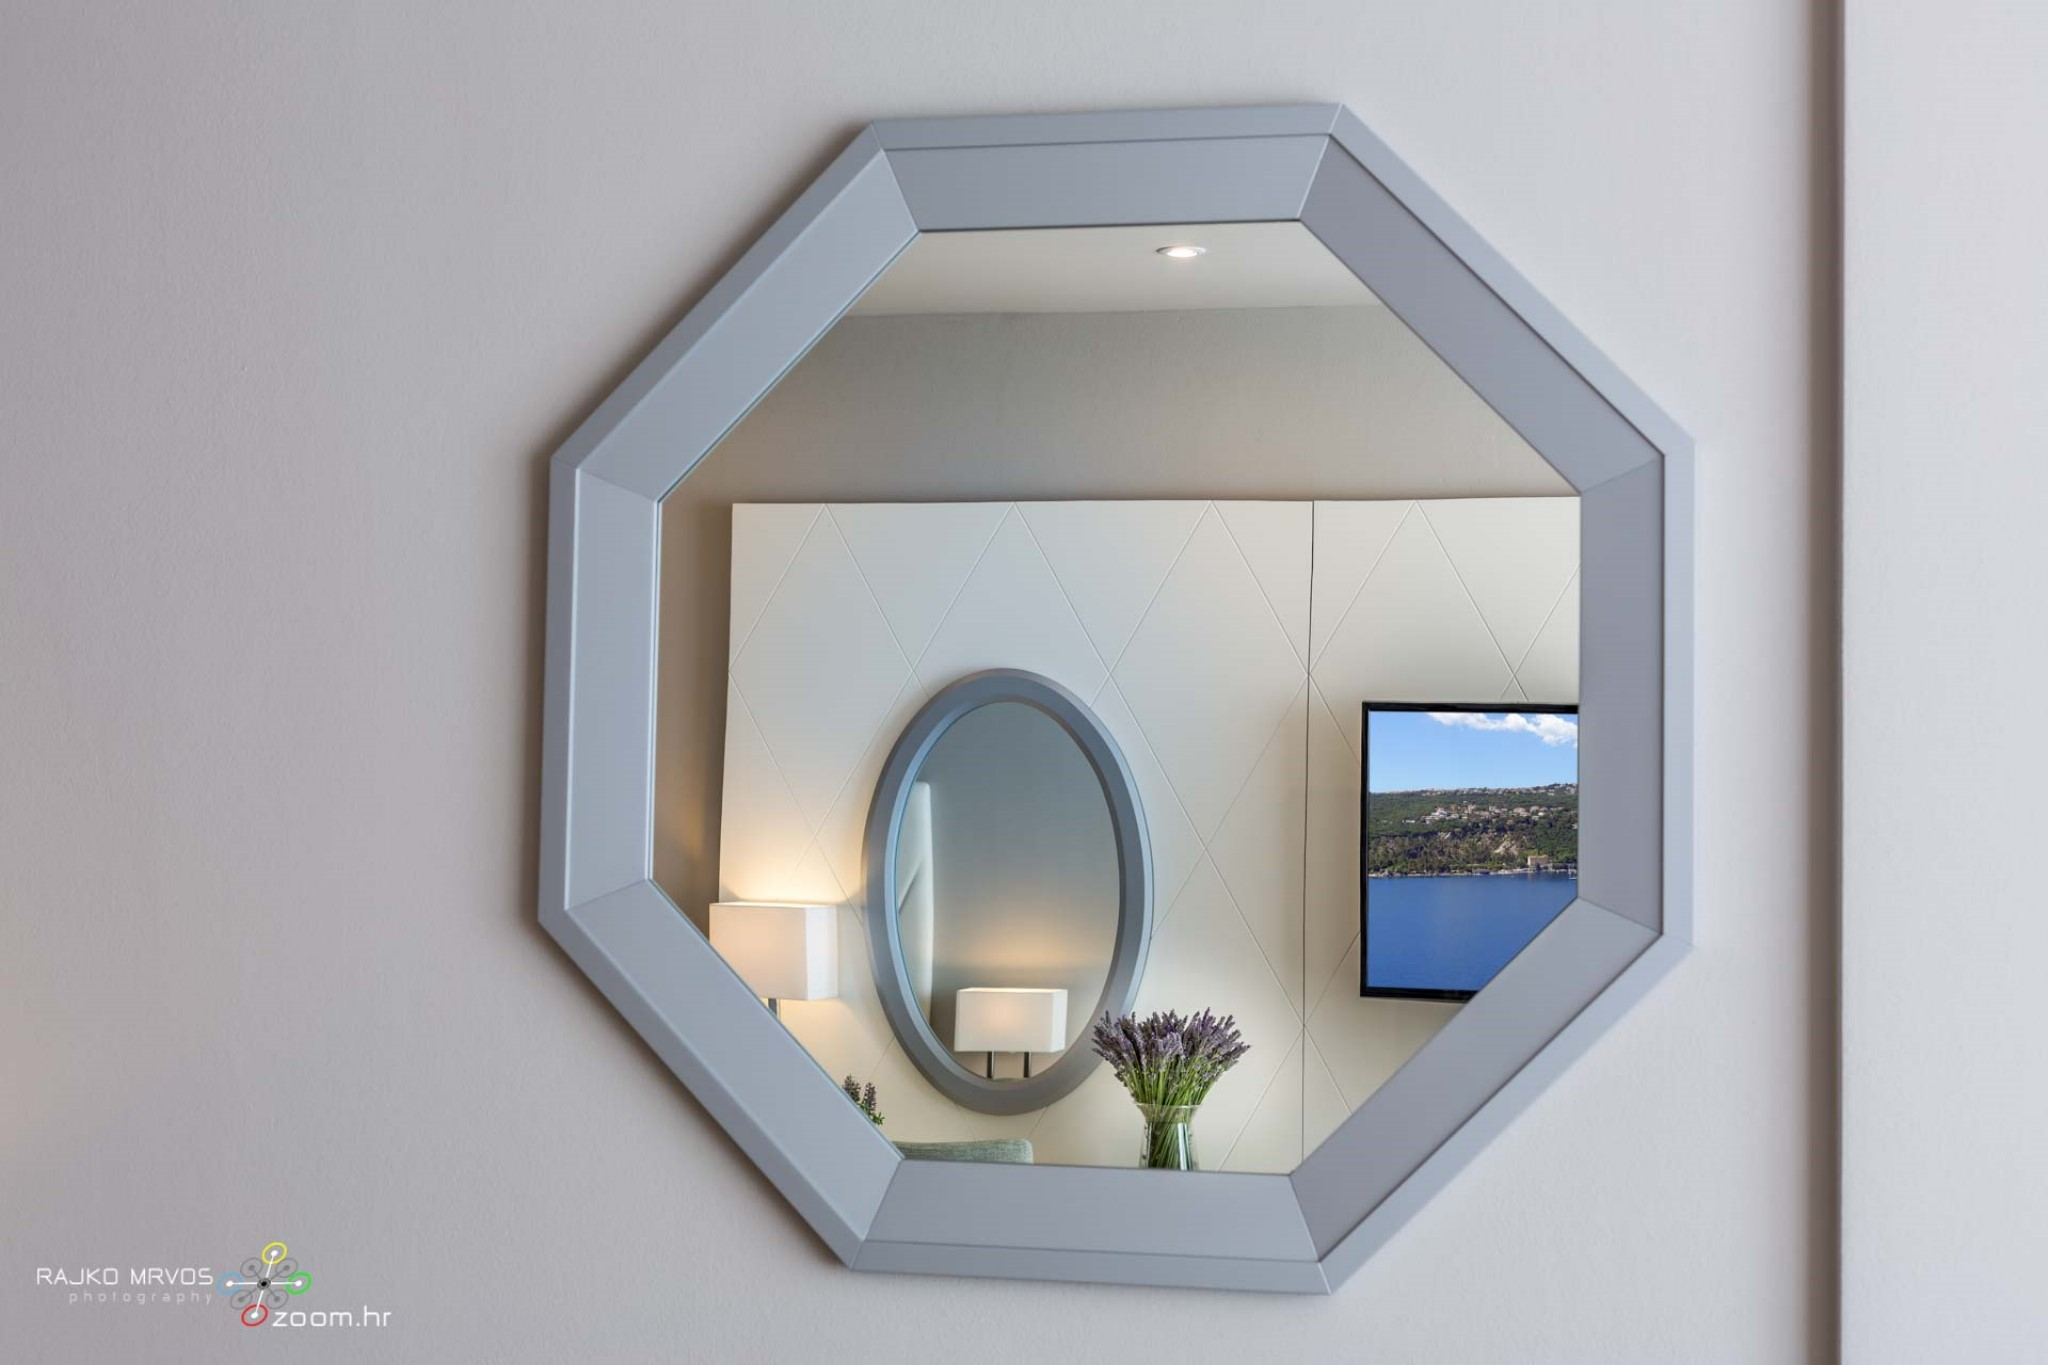 fotografiranje-interijera-fotograf-eksterijera-apartmana-vila-kuca-apartman-Preelook-7